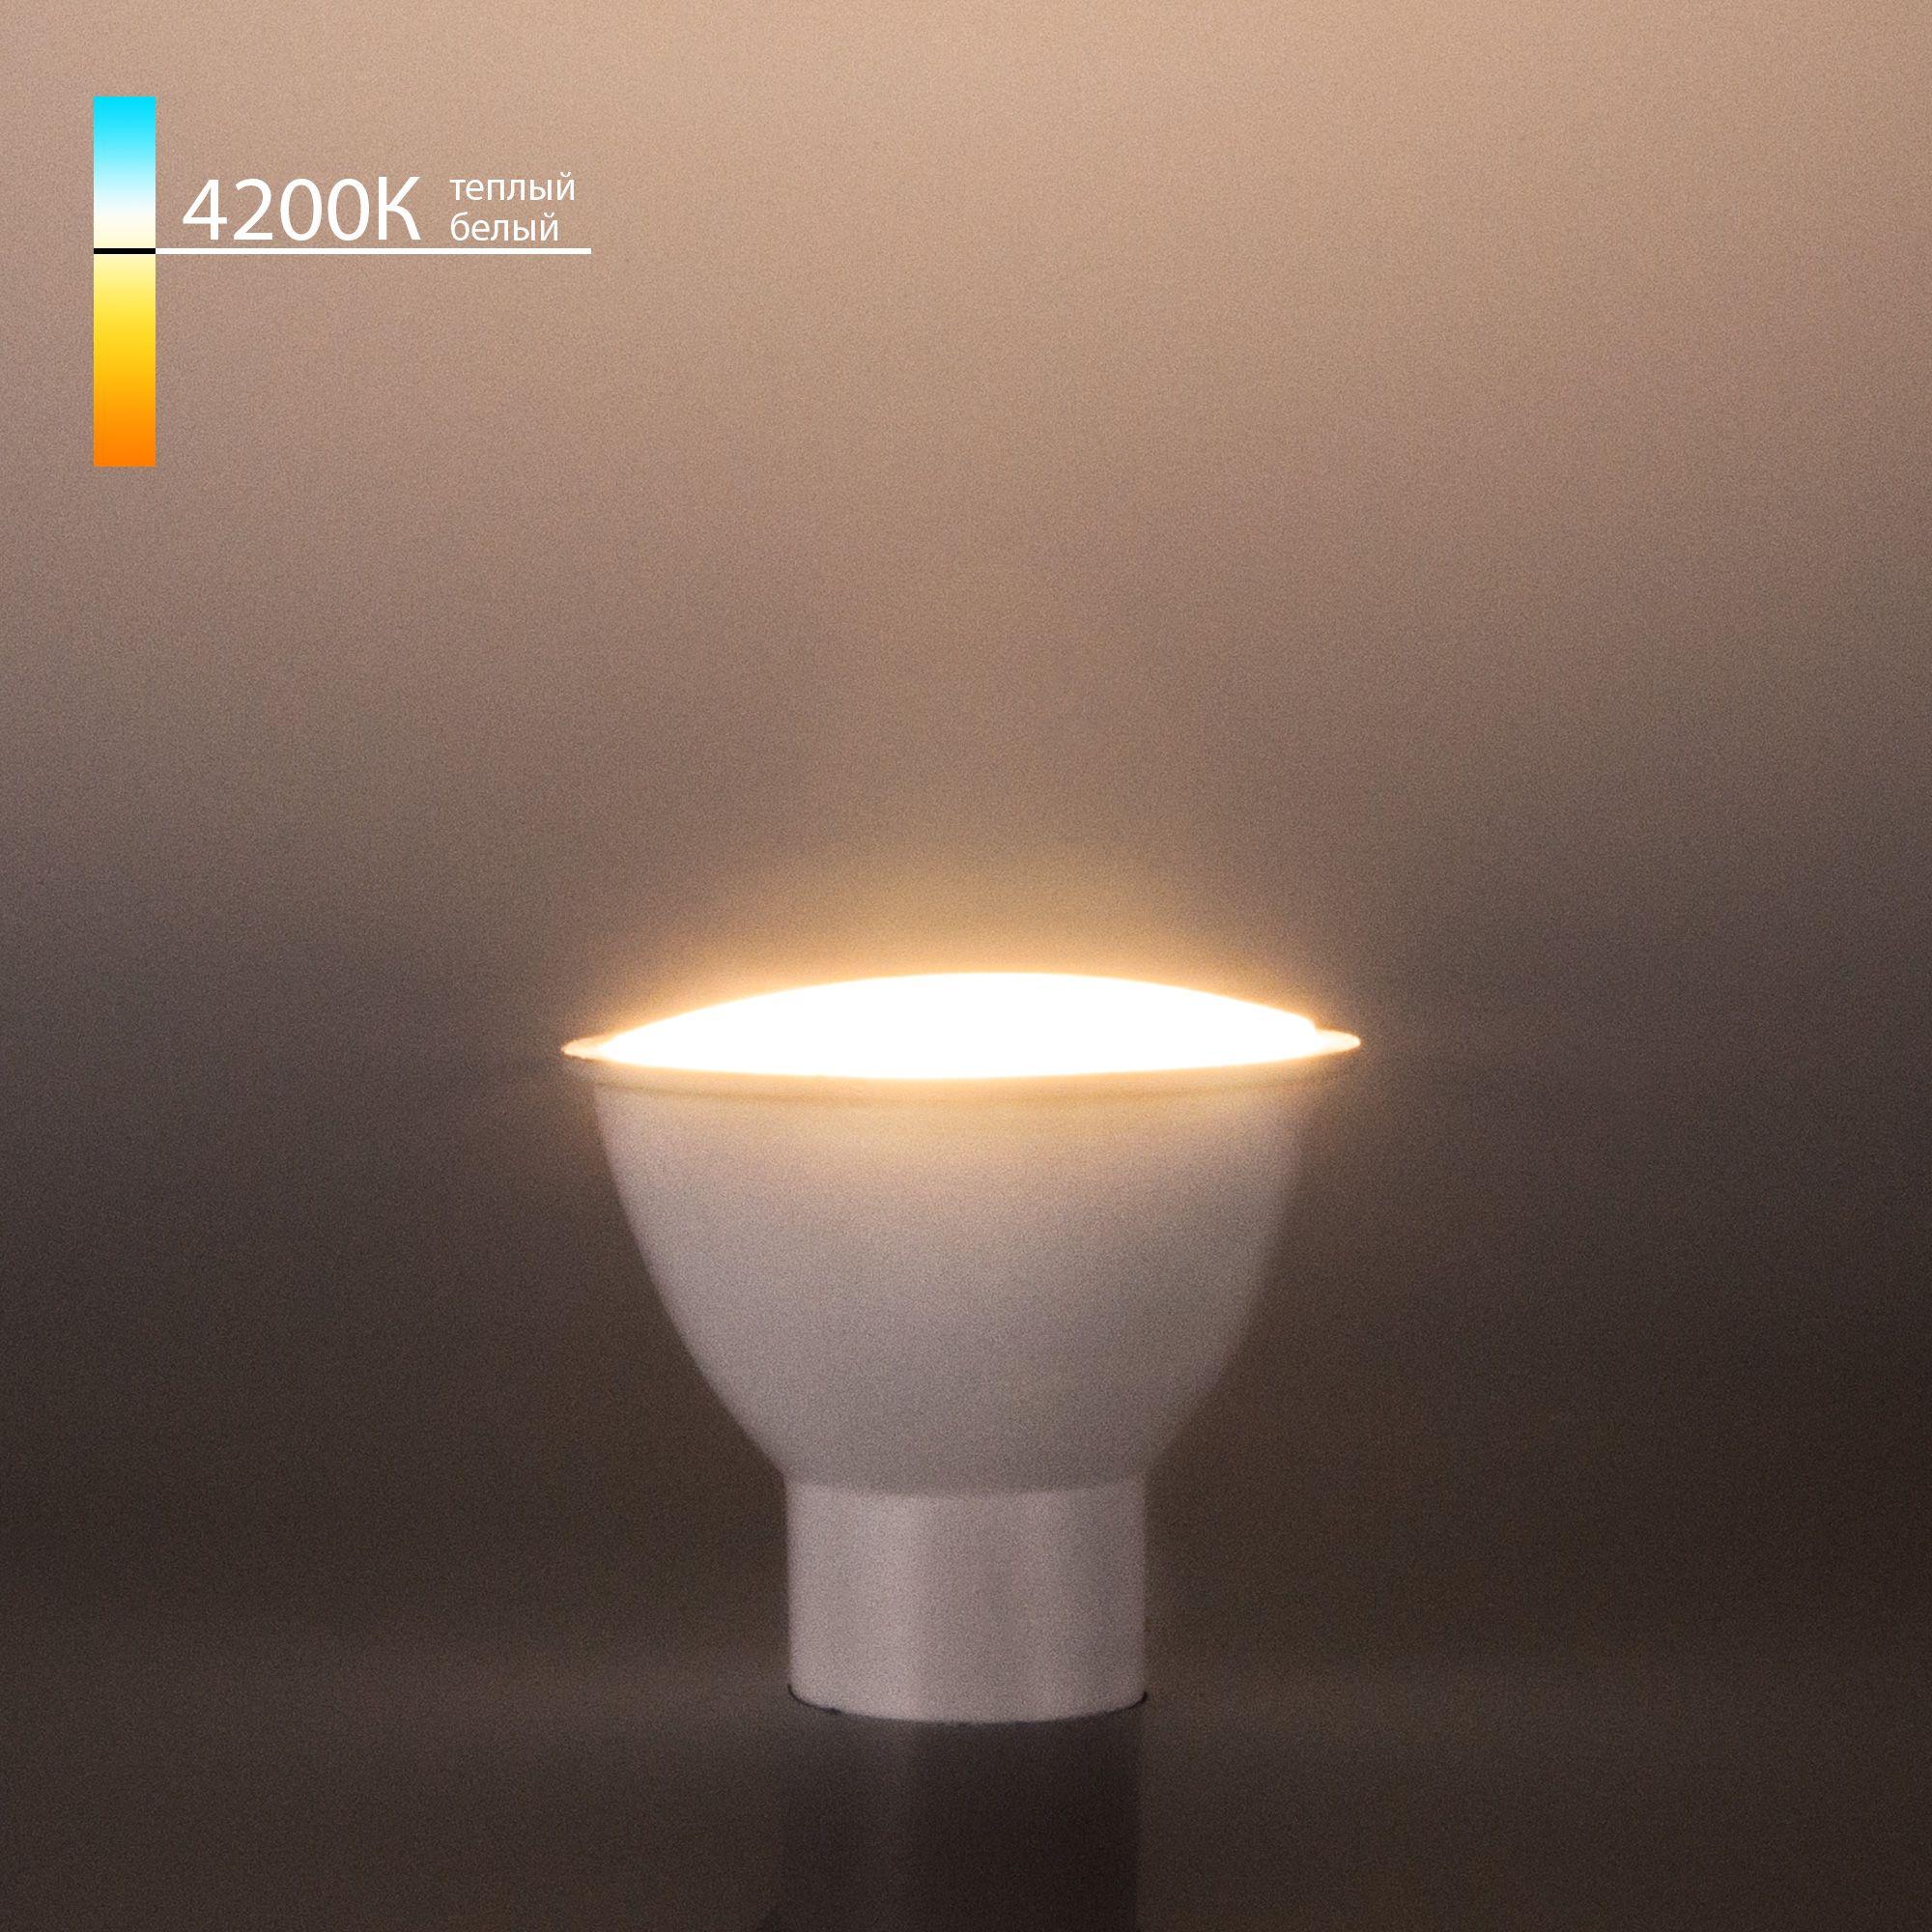 Светодиодная лампа GU10 LED 5W 4200K